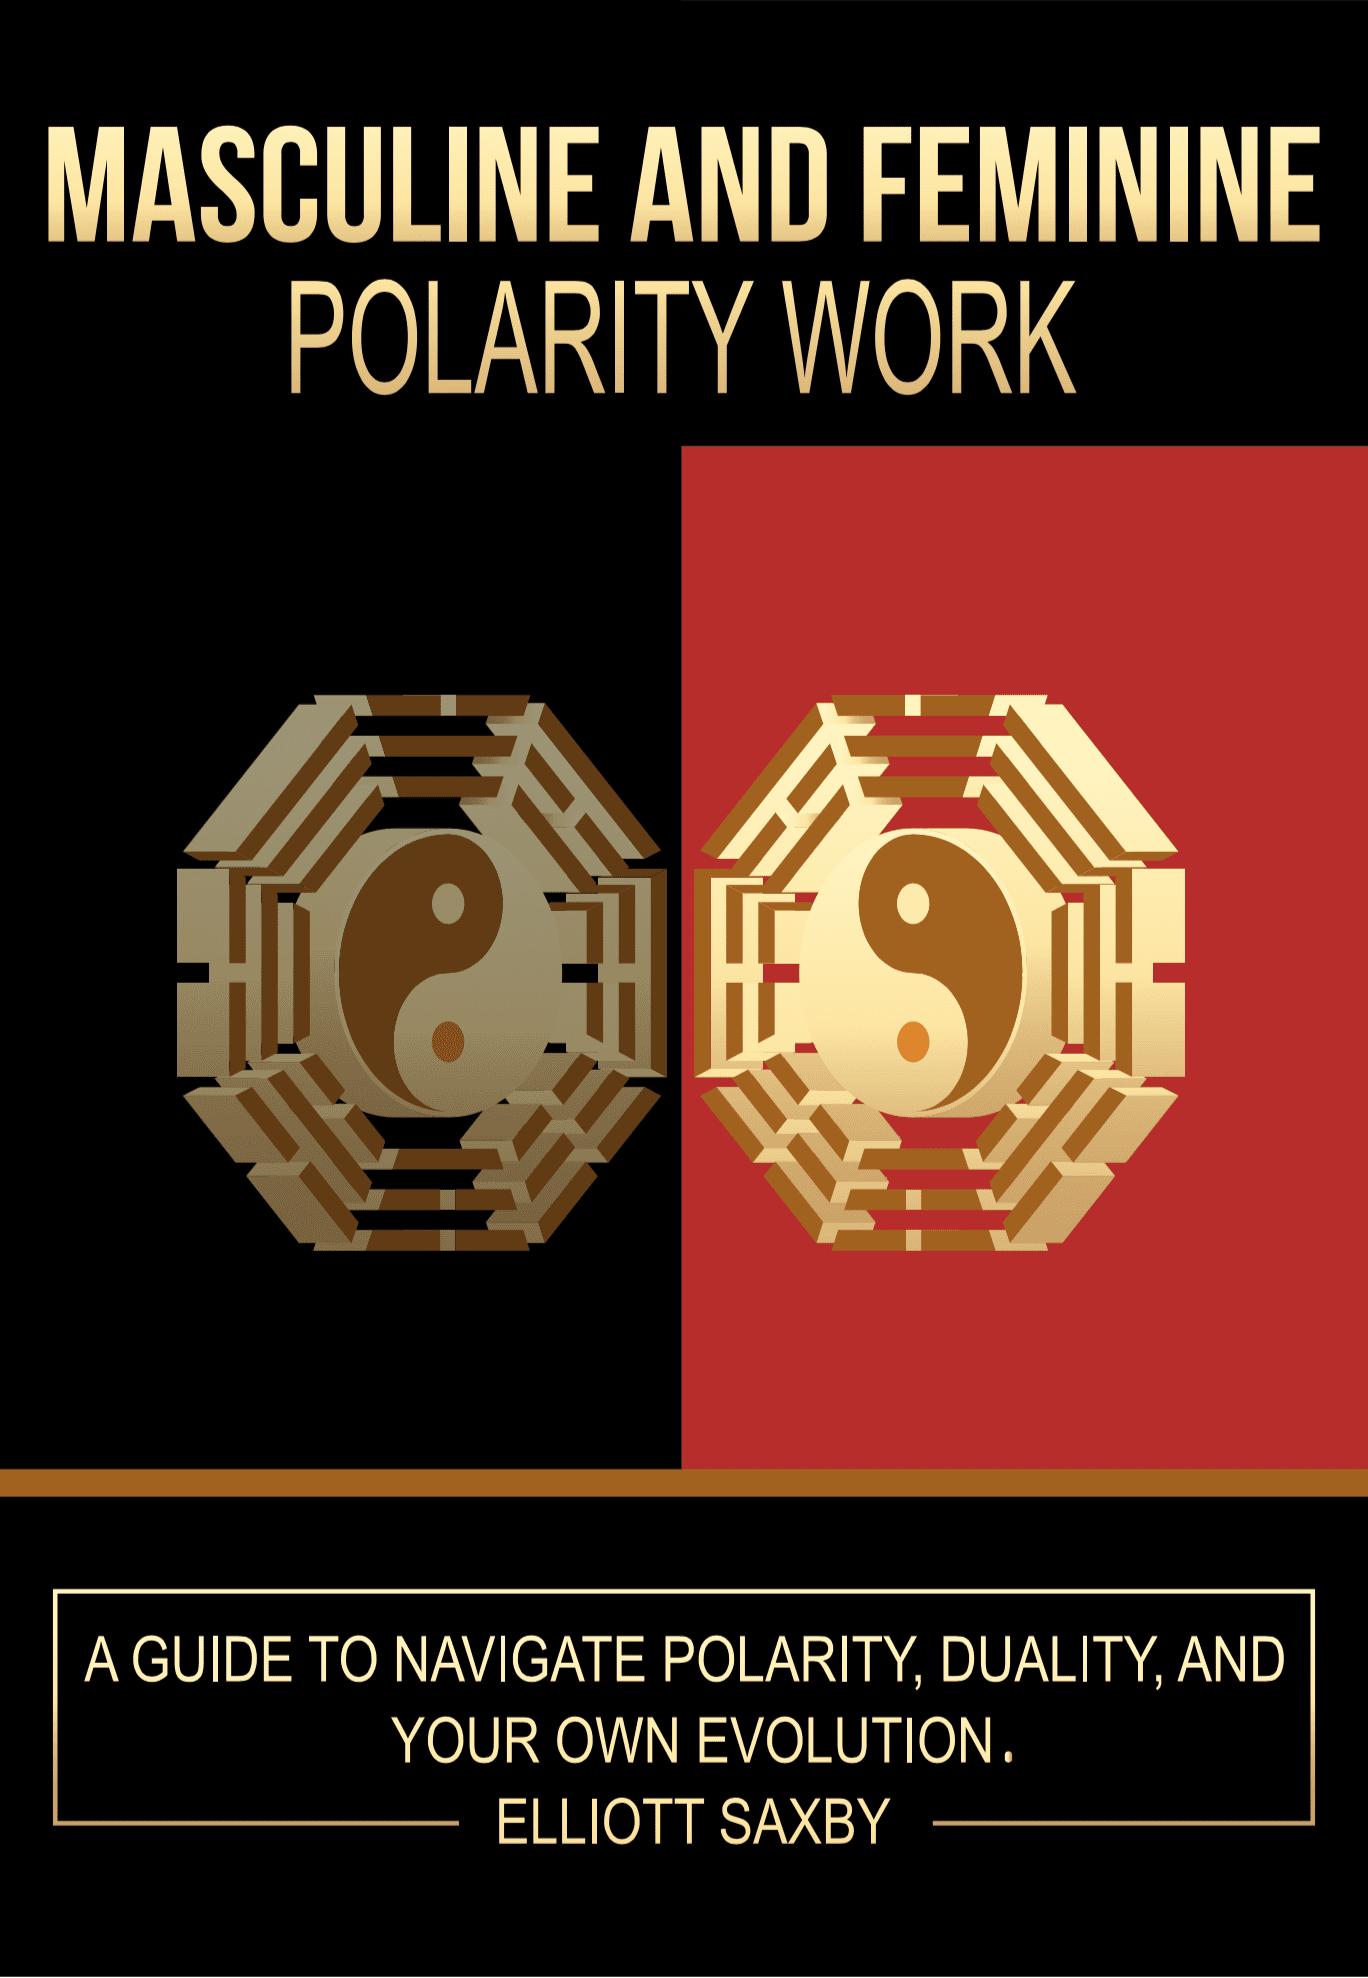 Masculine and Feminine polarity work